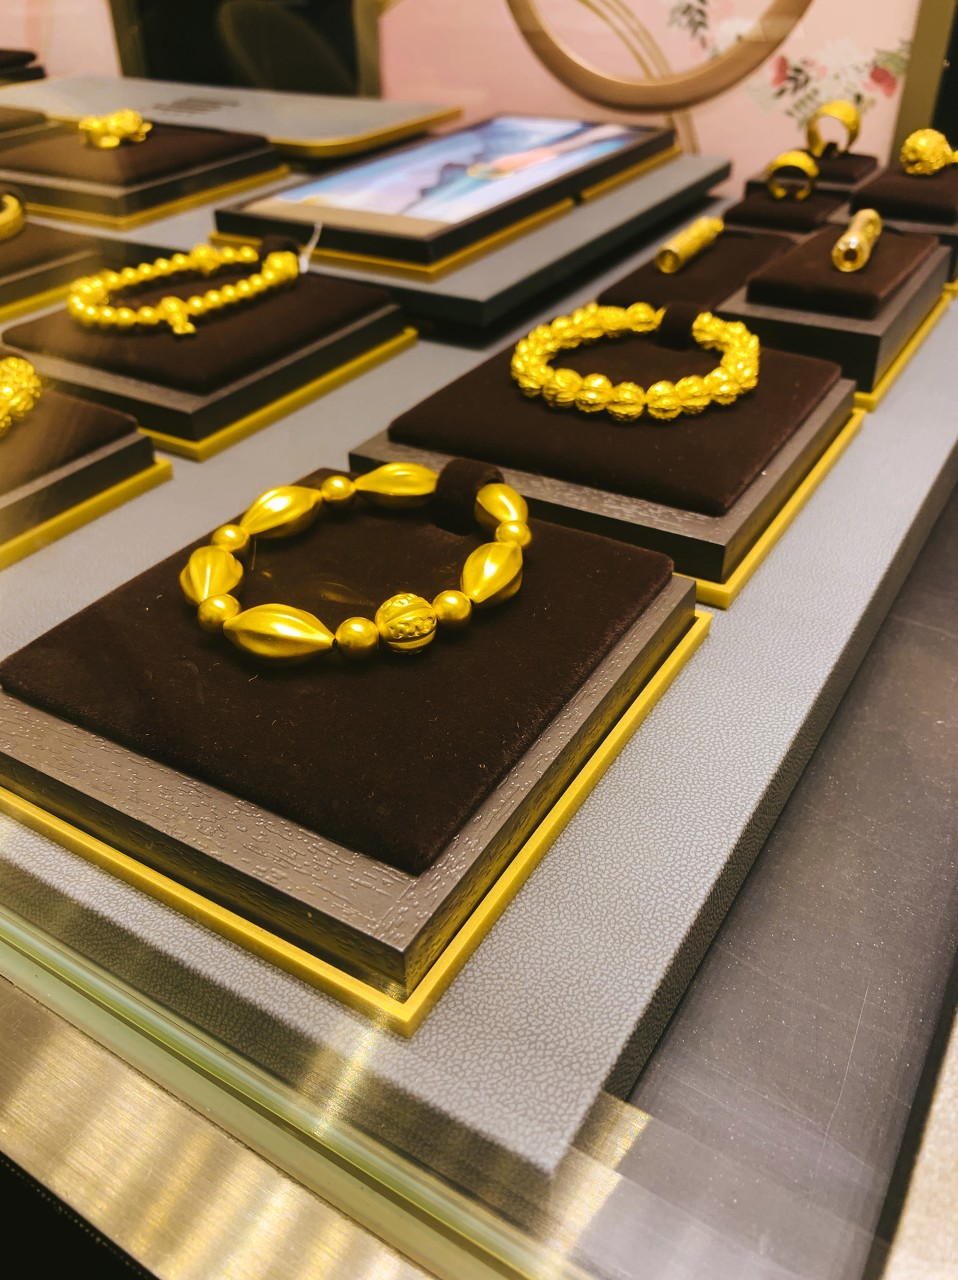 Silverdoctor9月发布报告 美联储准备增加黄金租赁数量